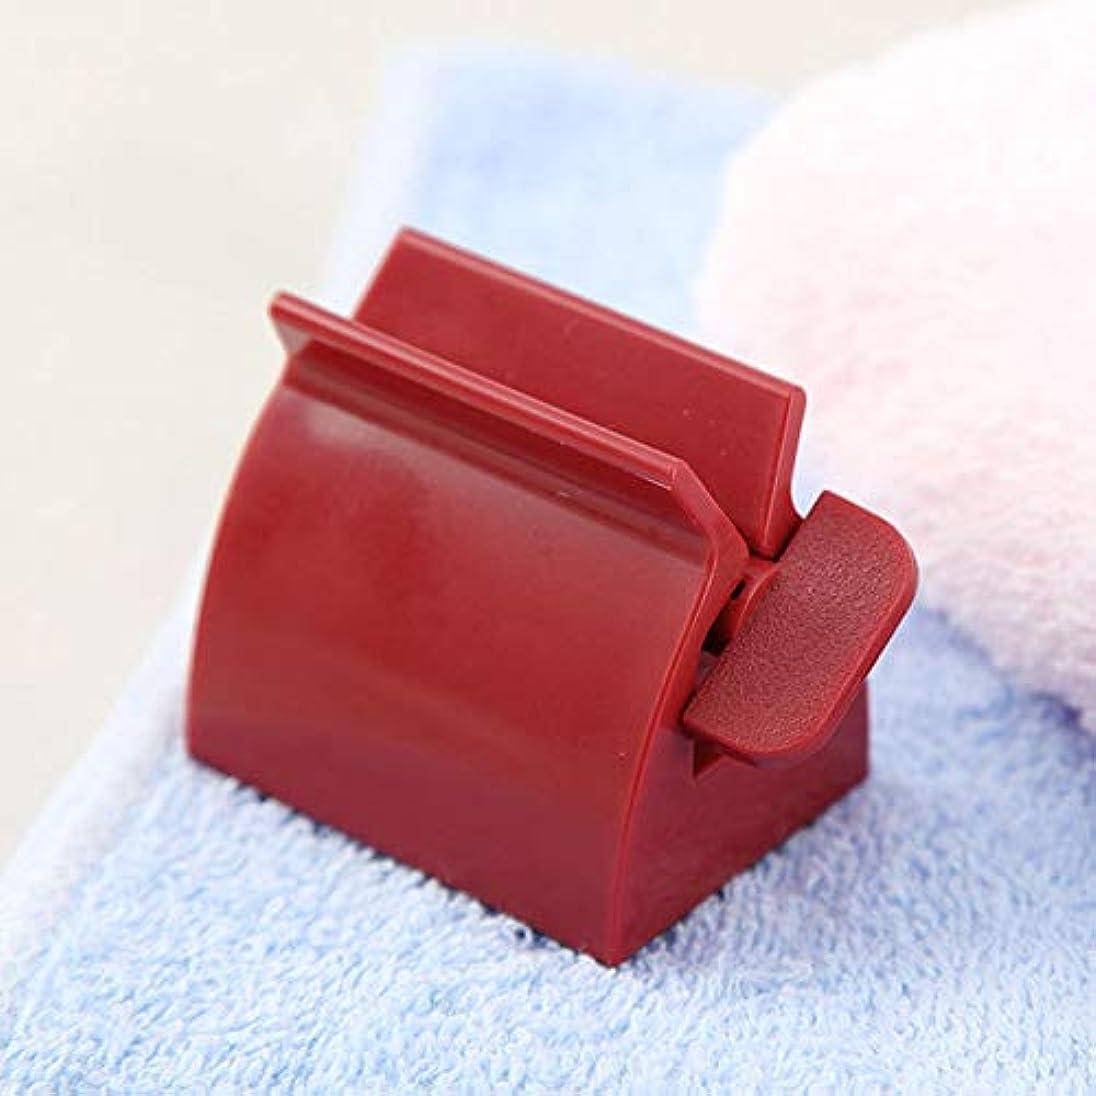 SODAOA屋 手動歯磨き粉スクイーザ 歯磨き粉 ホルダー バスルーム洗顔料 化粧品 クリーム ハンドクリーム 節約 ローリングチューブスクイーザー便利 練り歯磨きスクイーザー 多機能 (レッド)